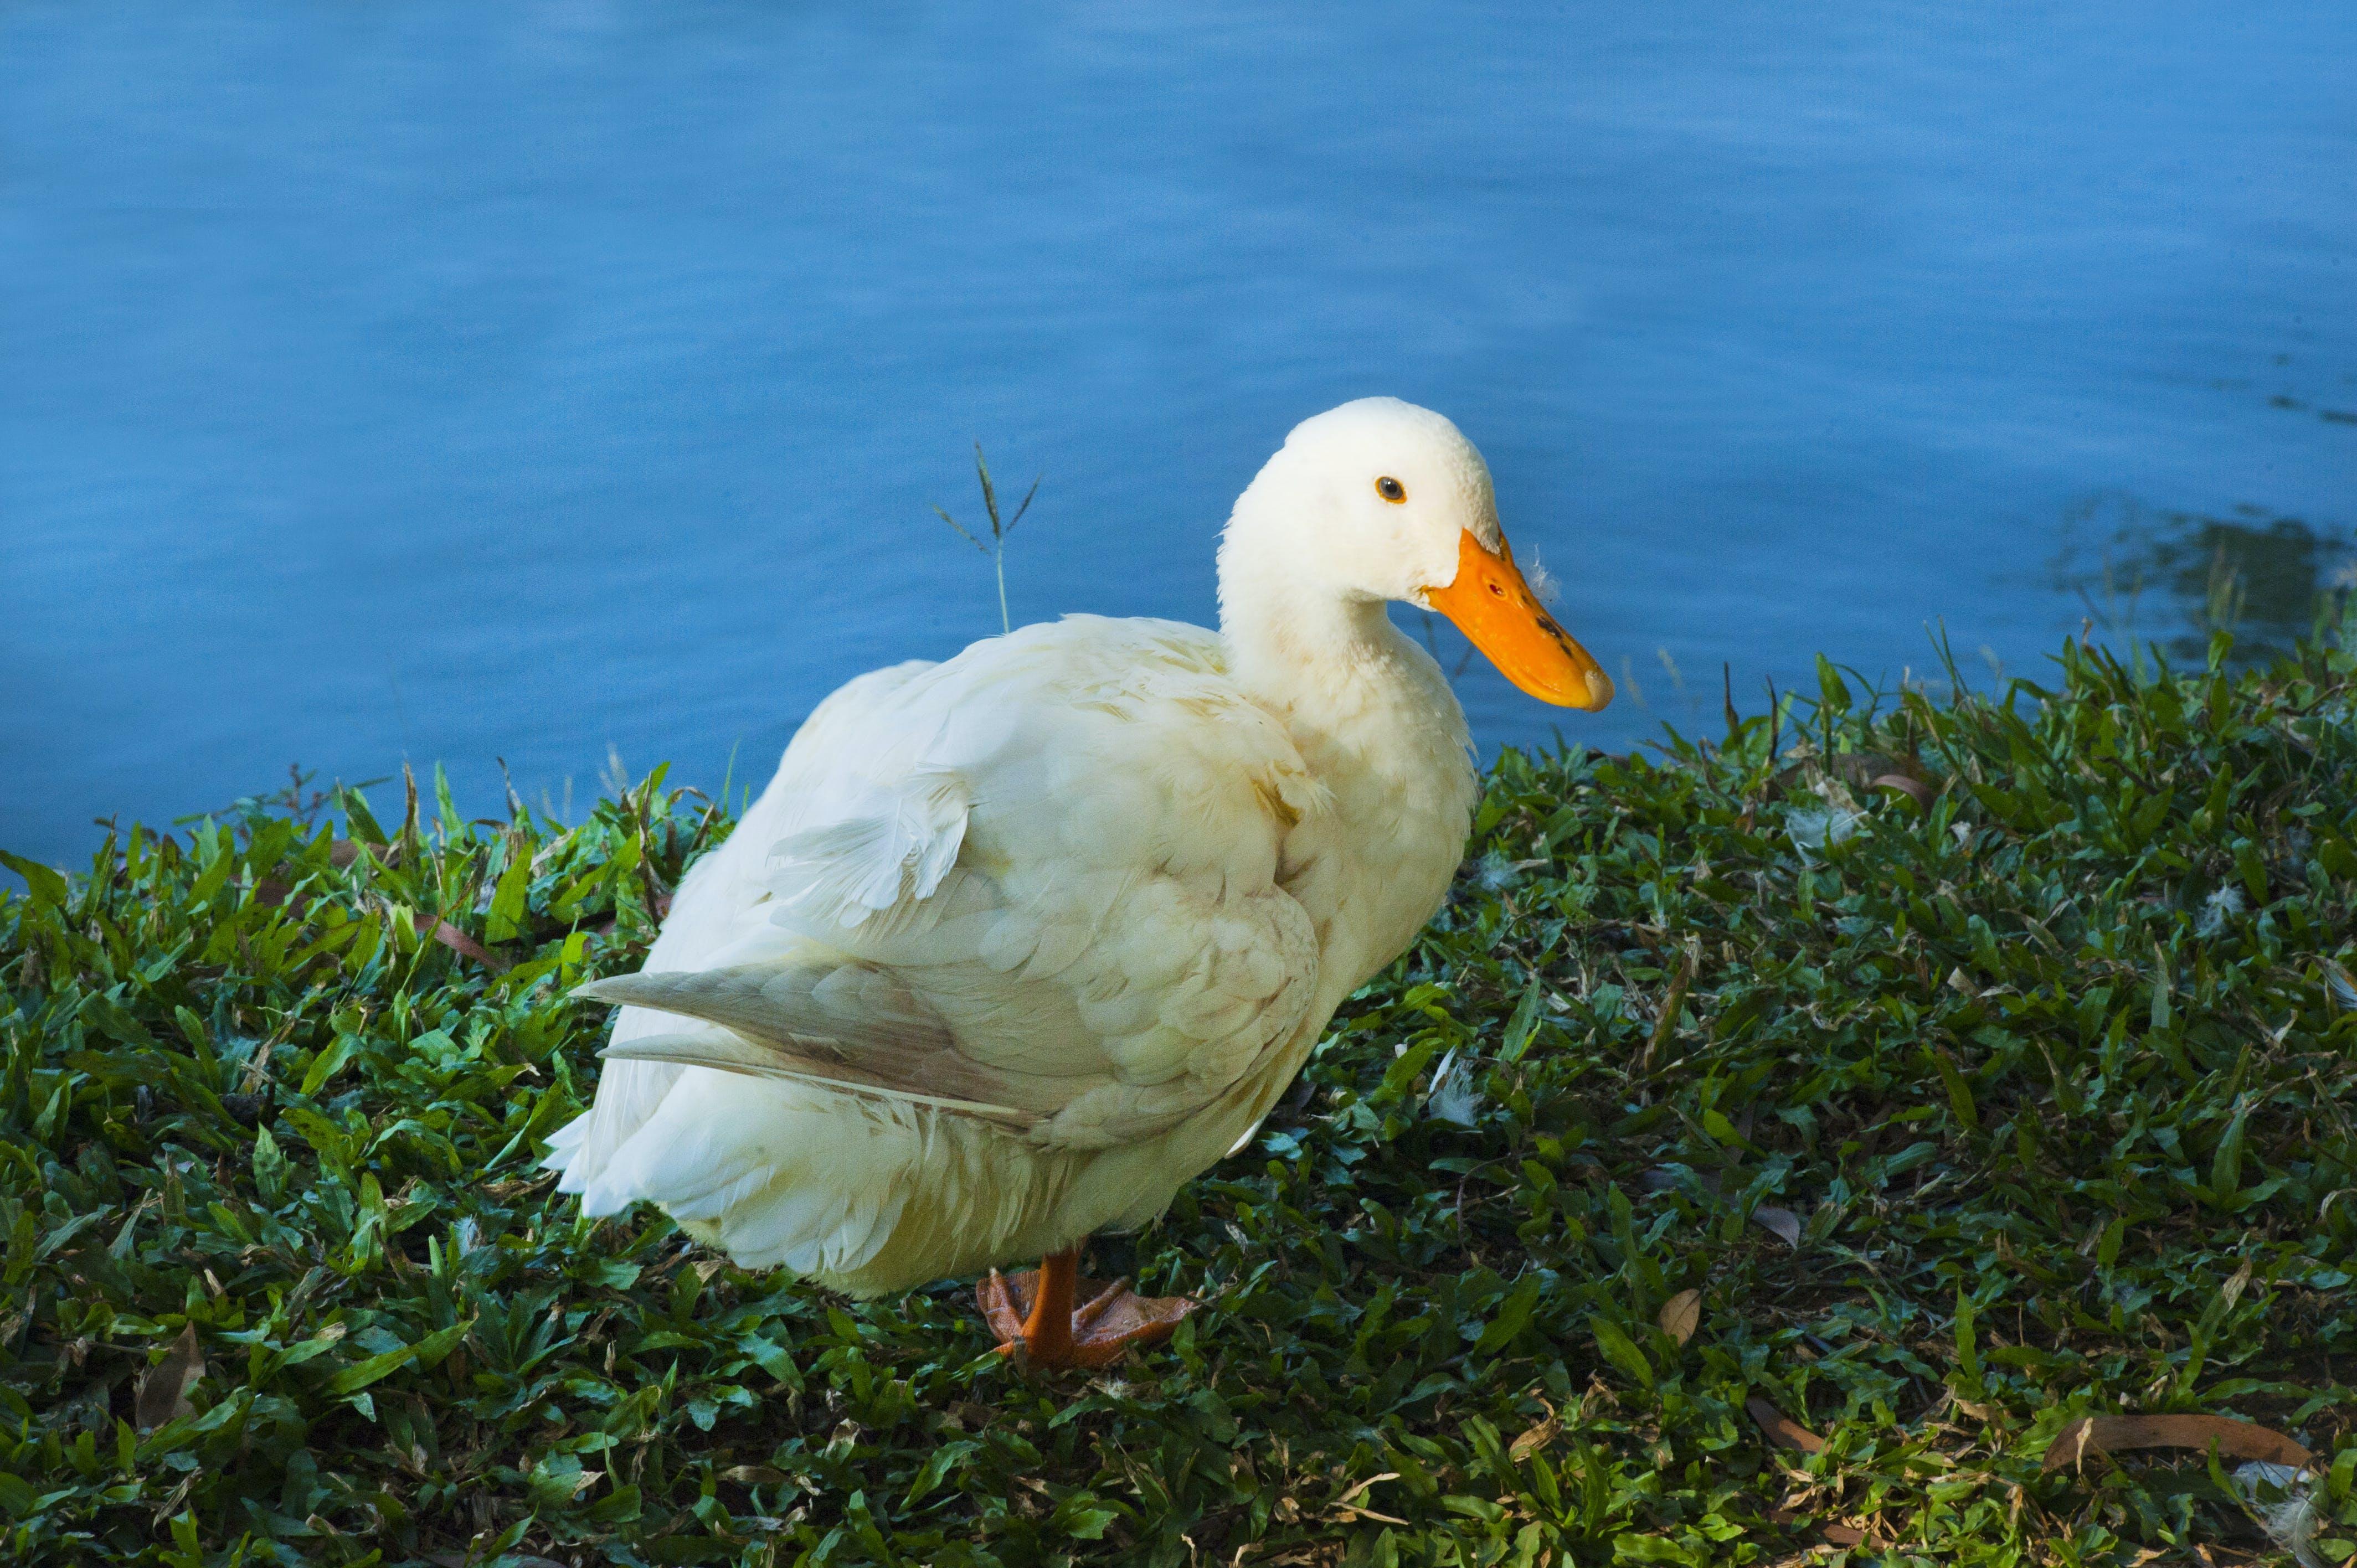 White Duck Near Water Close-up Photo